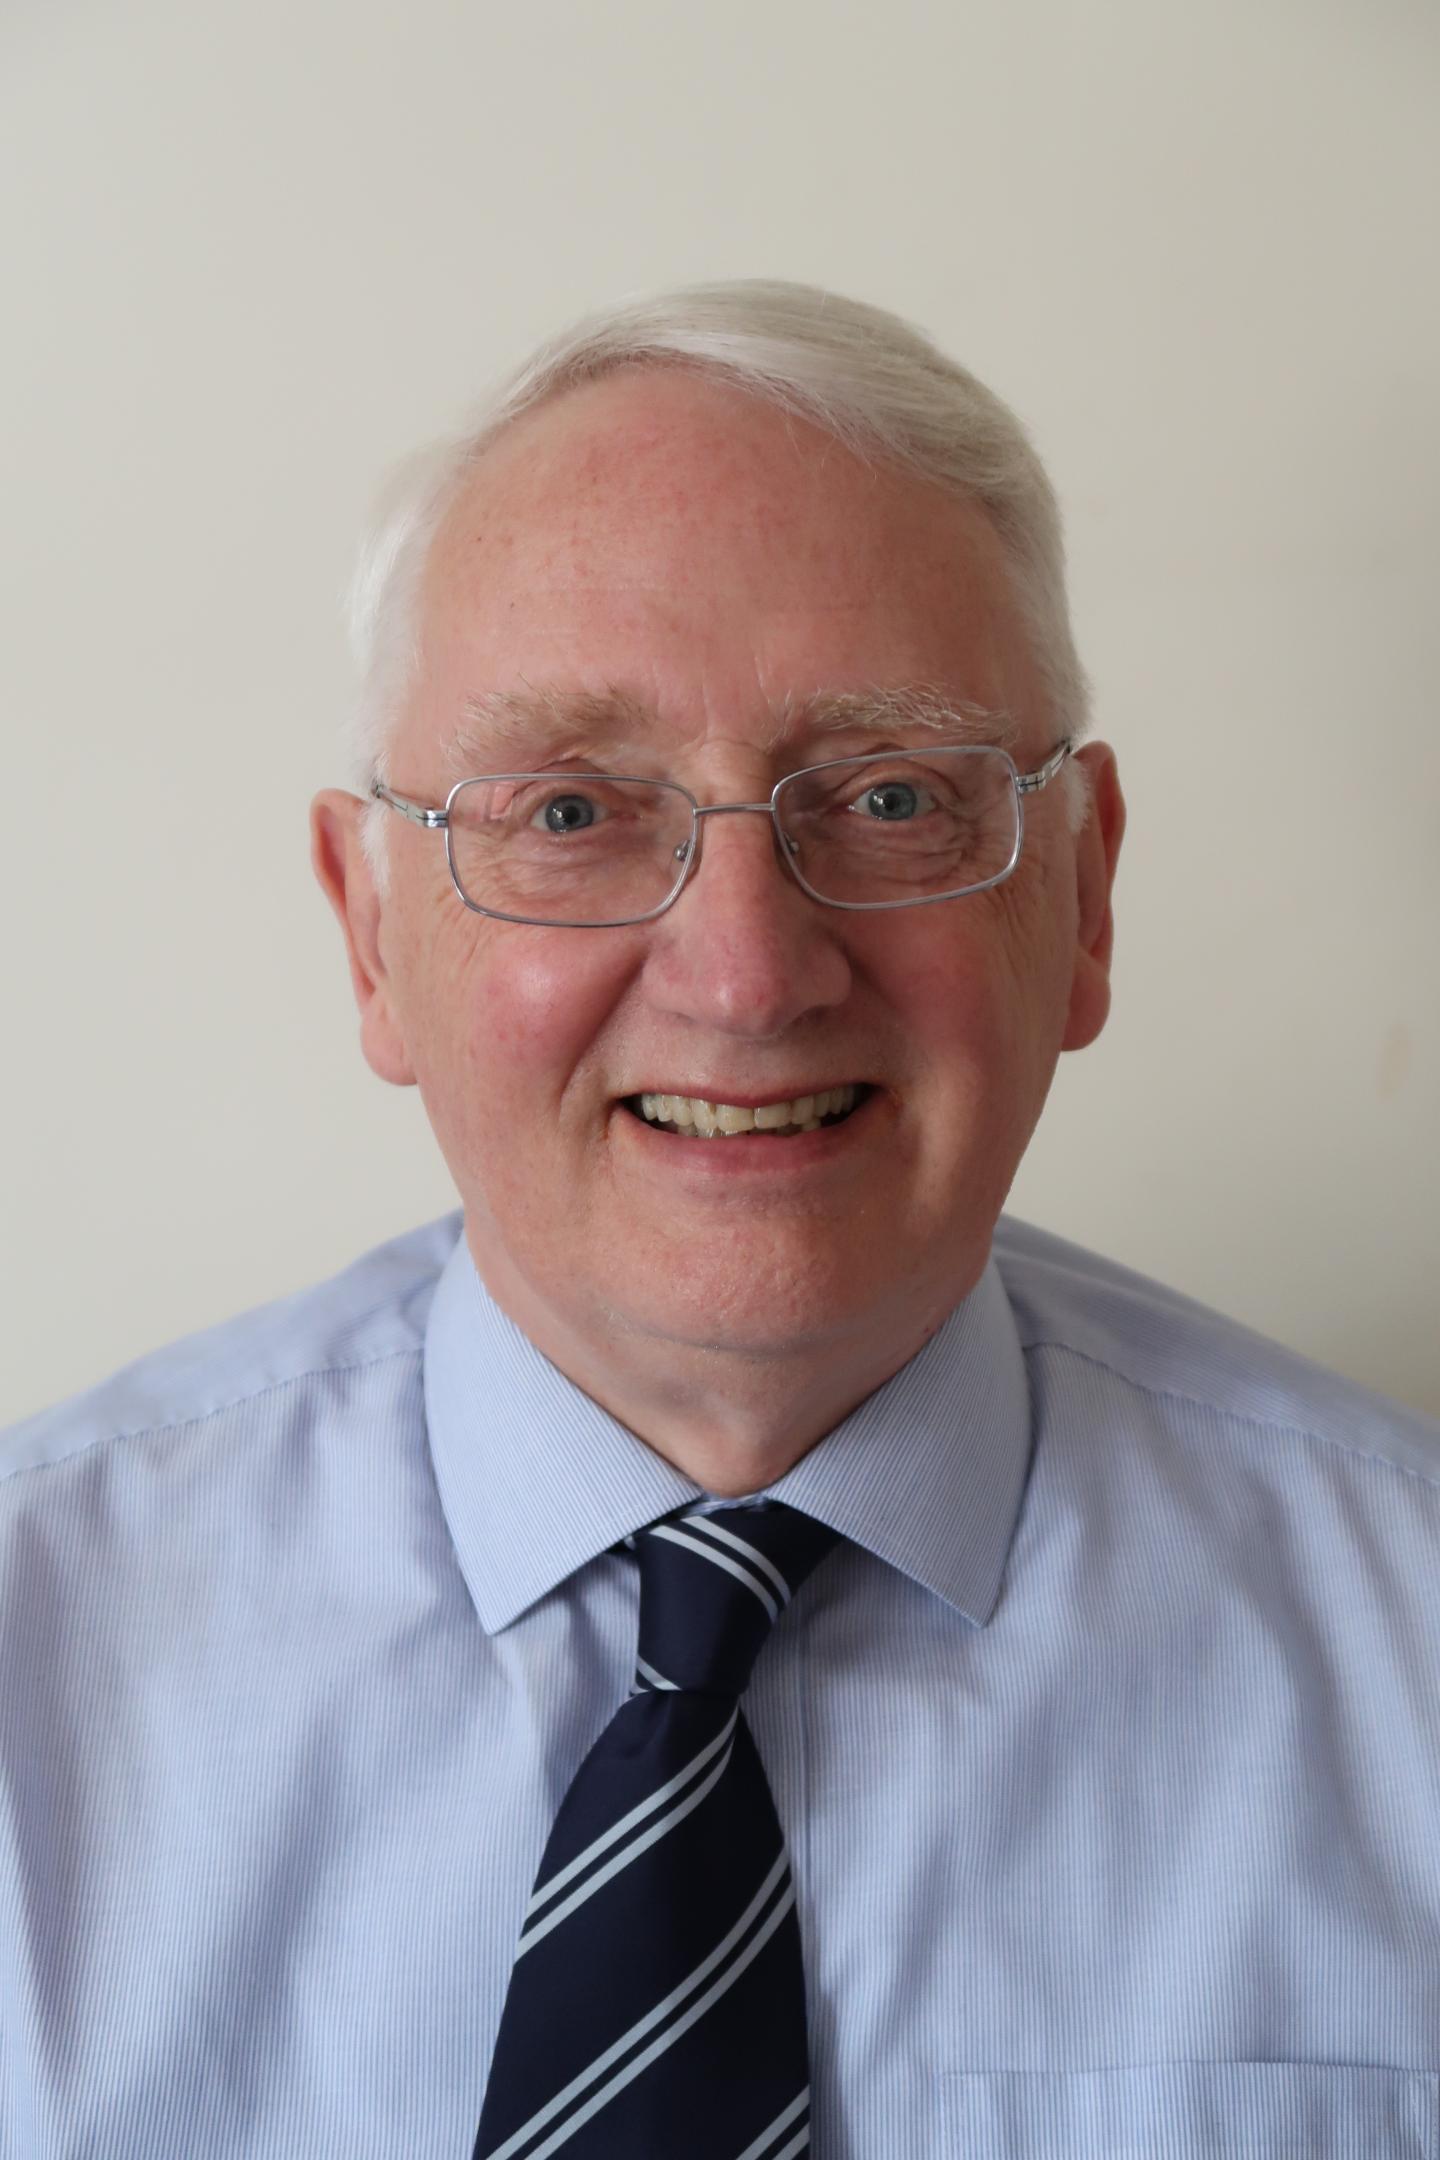 Andrew McGettrick, University of Strathclyde